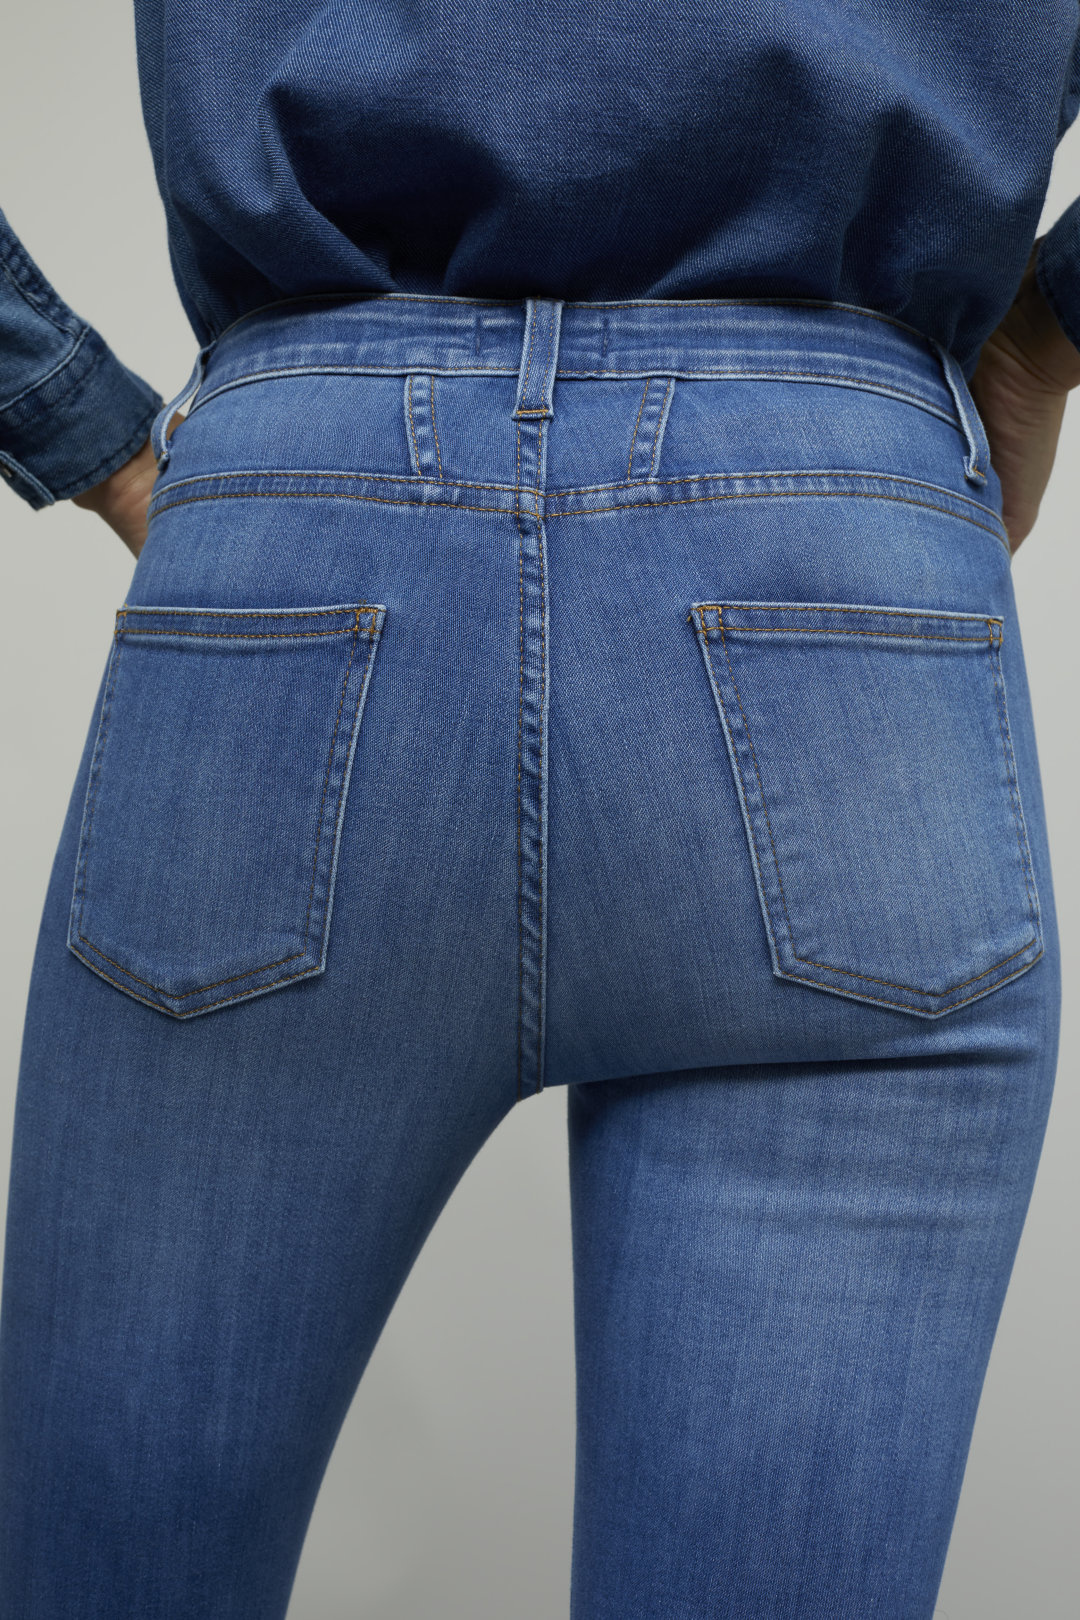 Closed Jeans C91099 08K 39-4